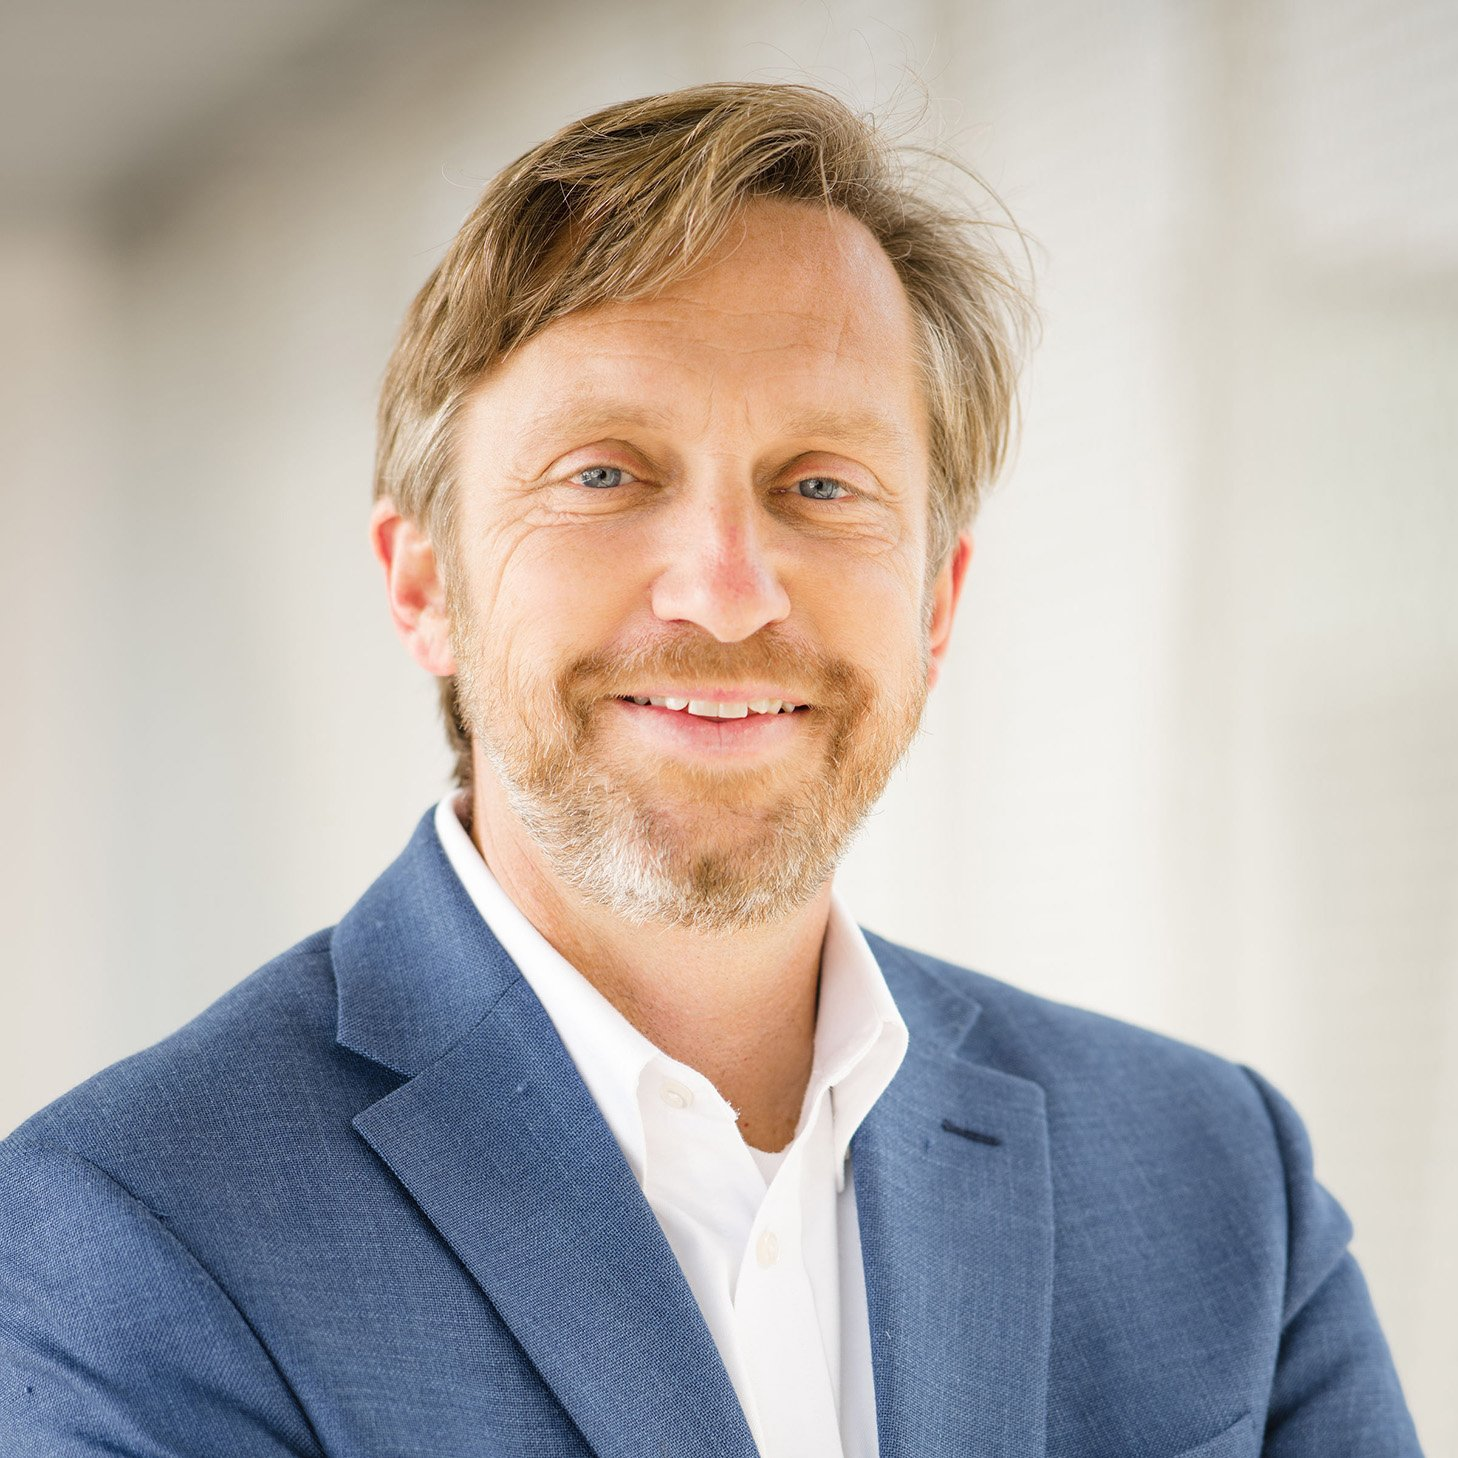 Victor Buchholz